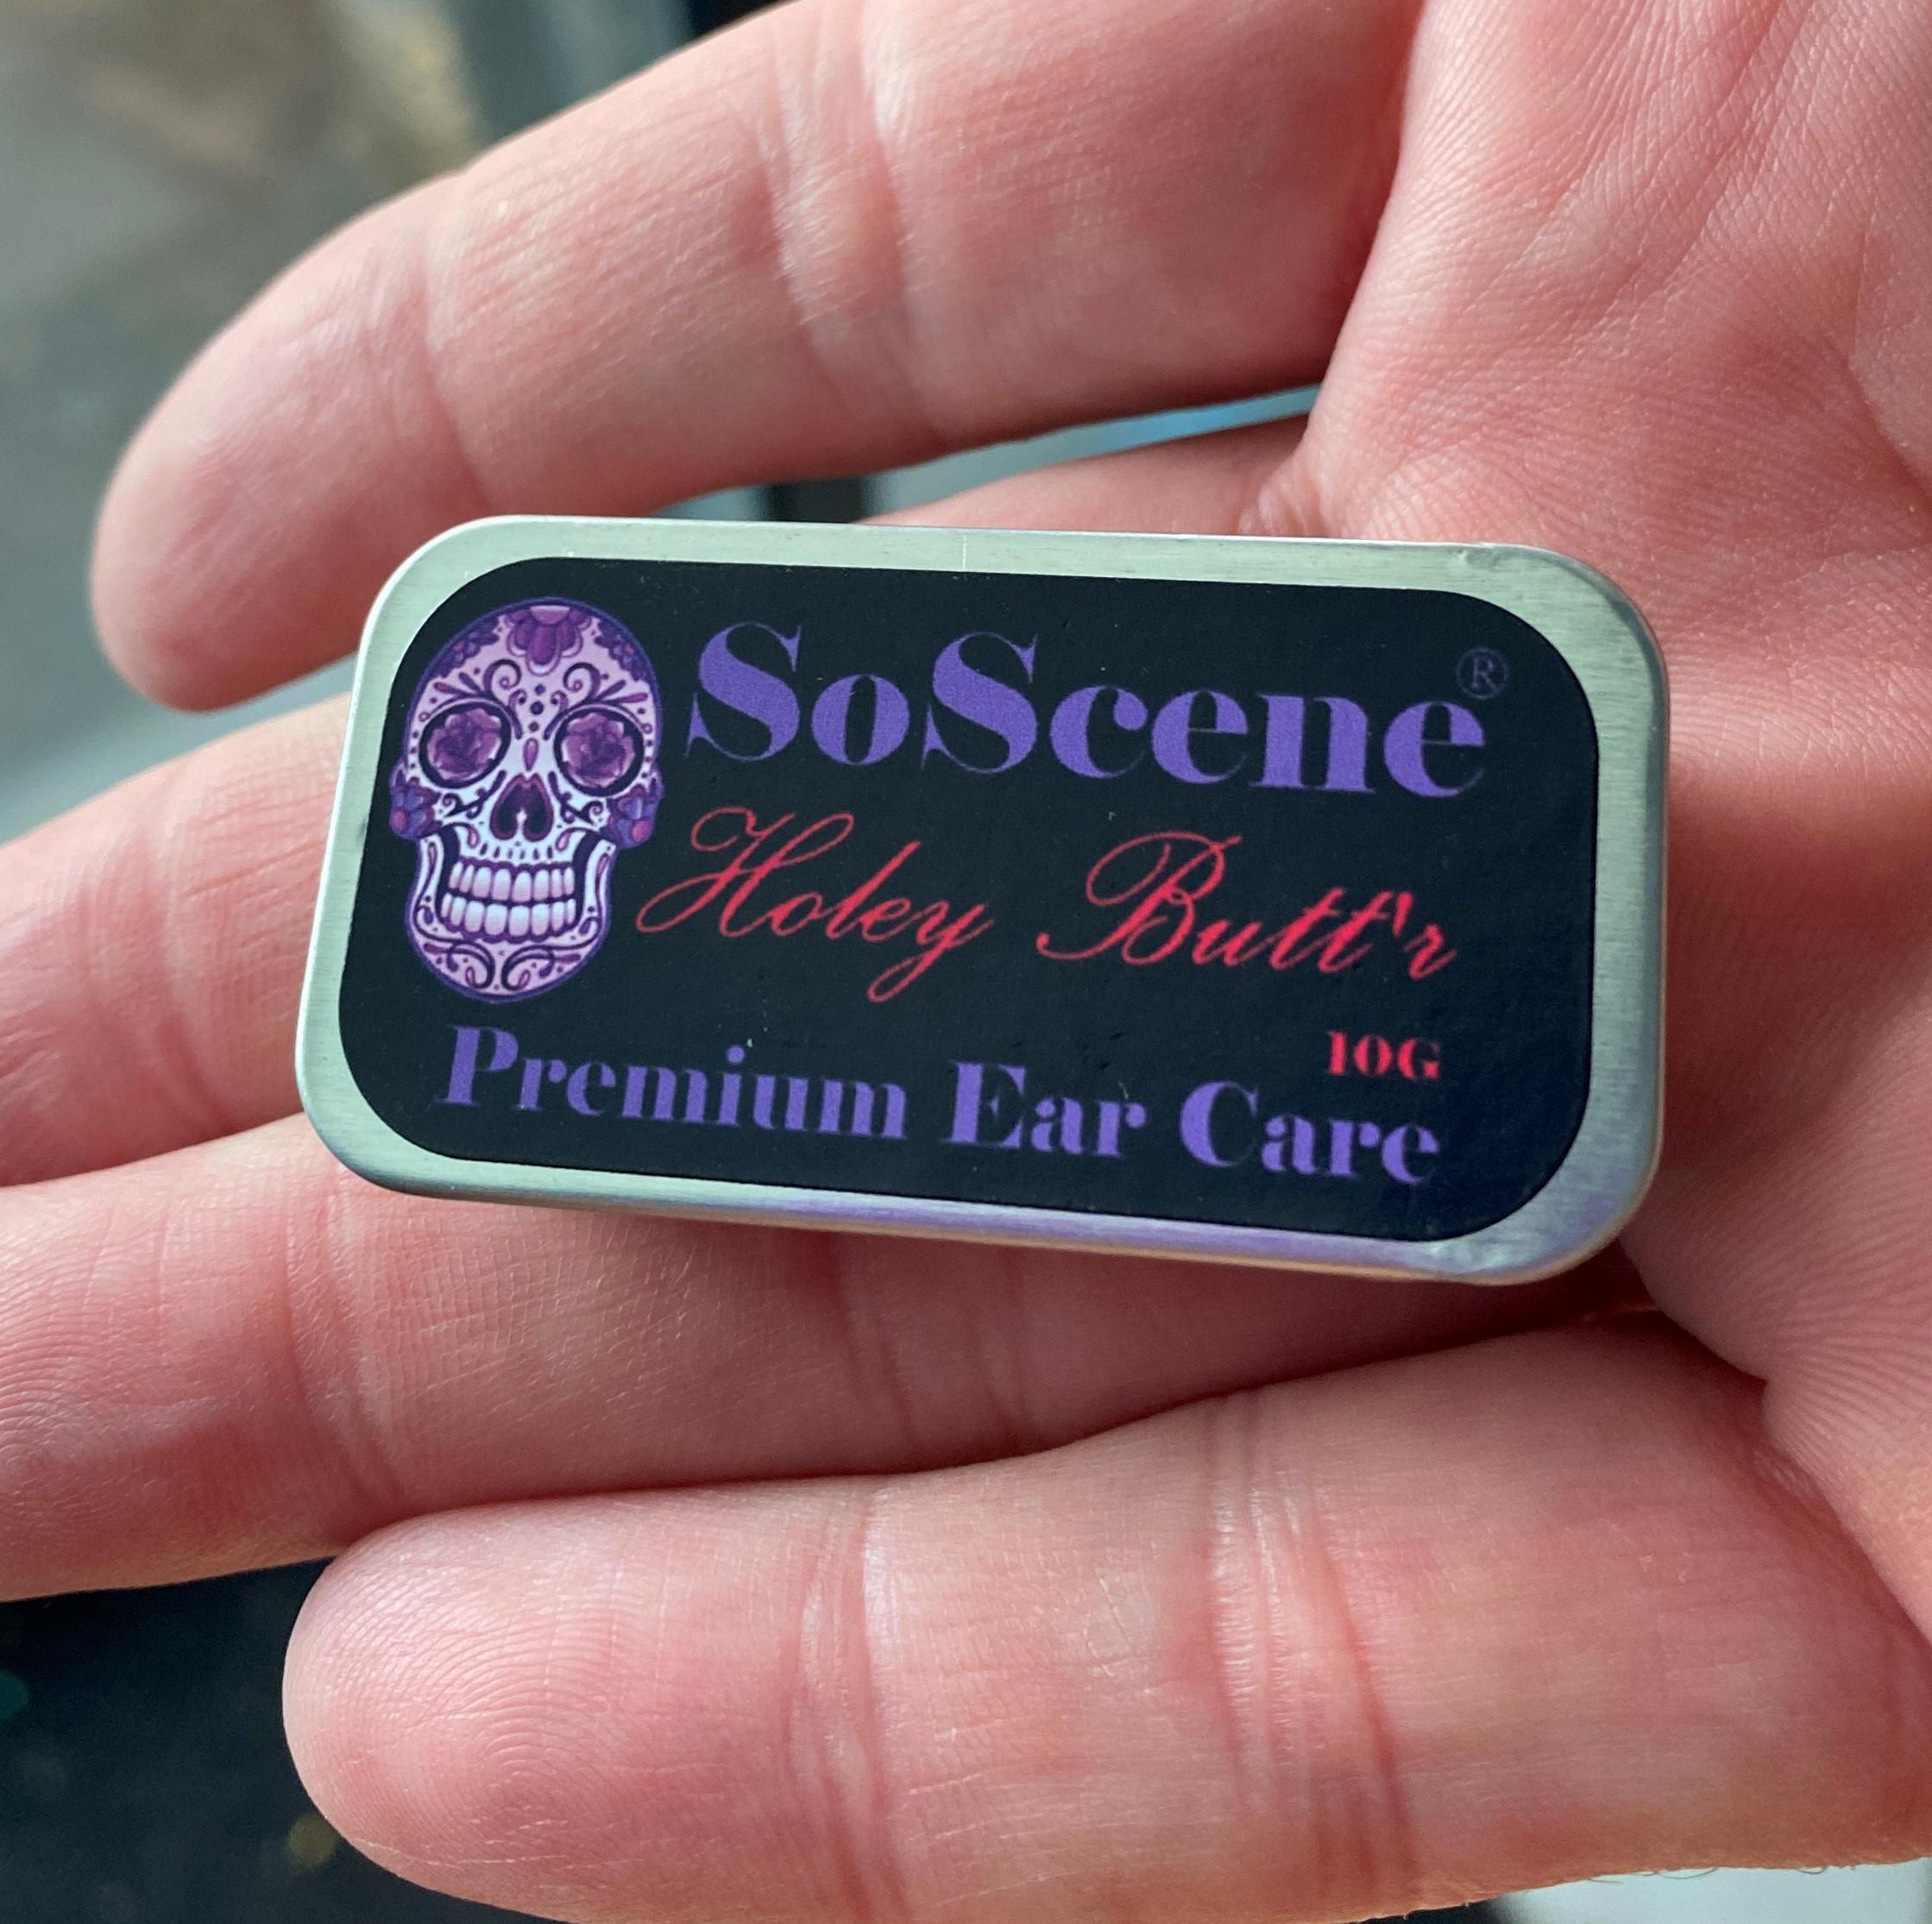 butter-in-hand-soscene-.jpg